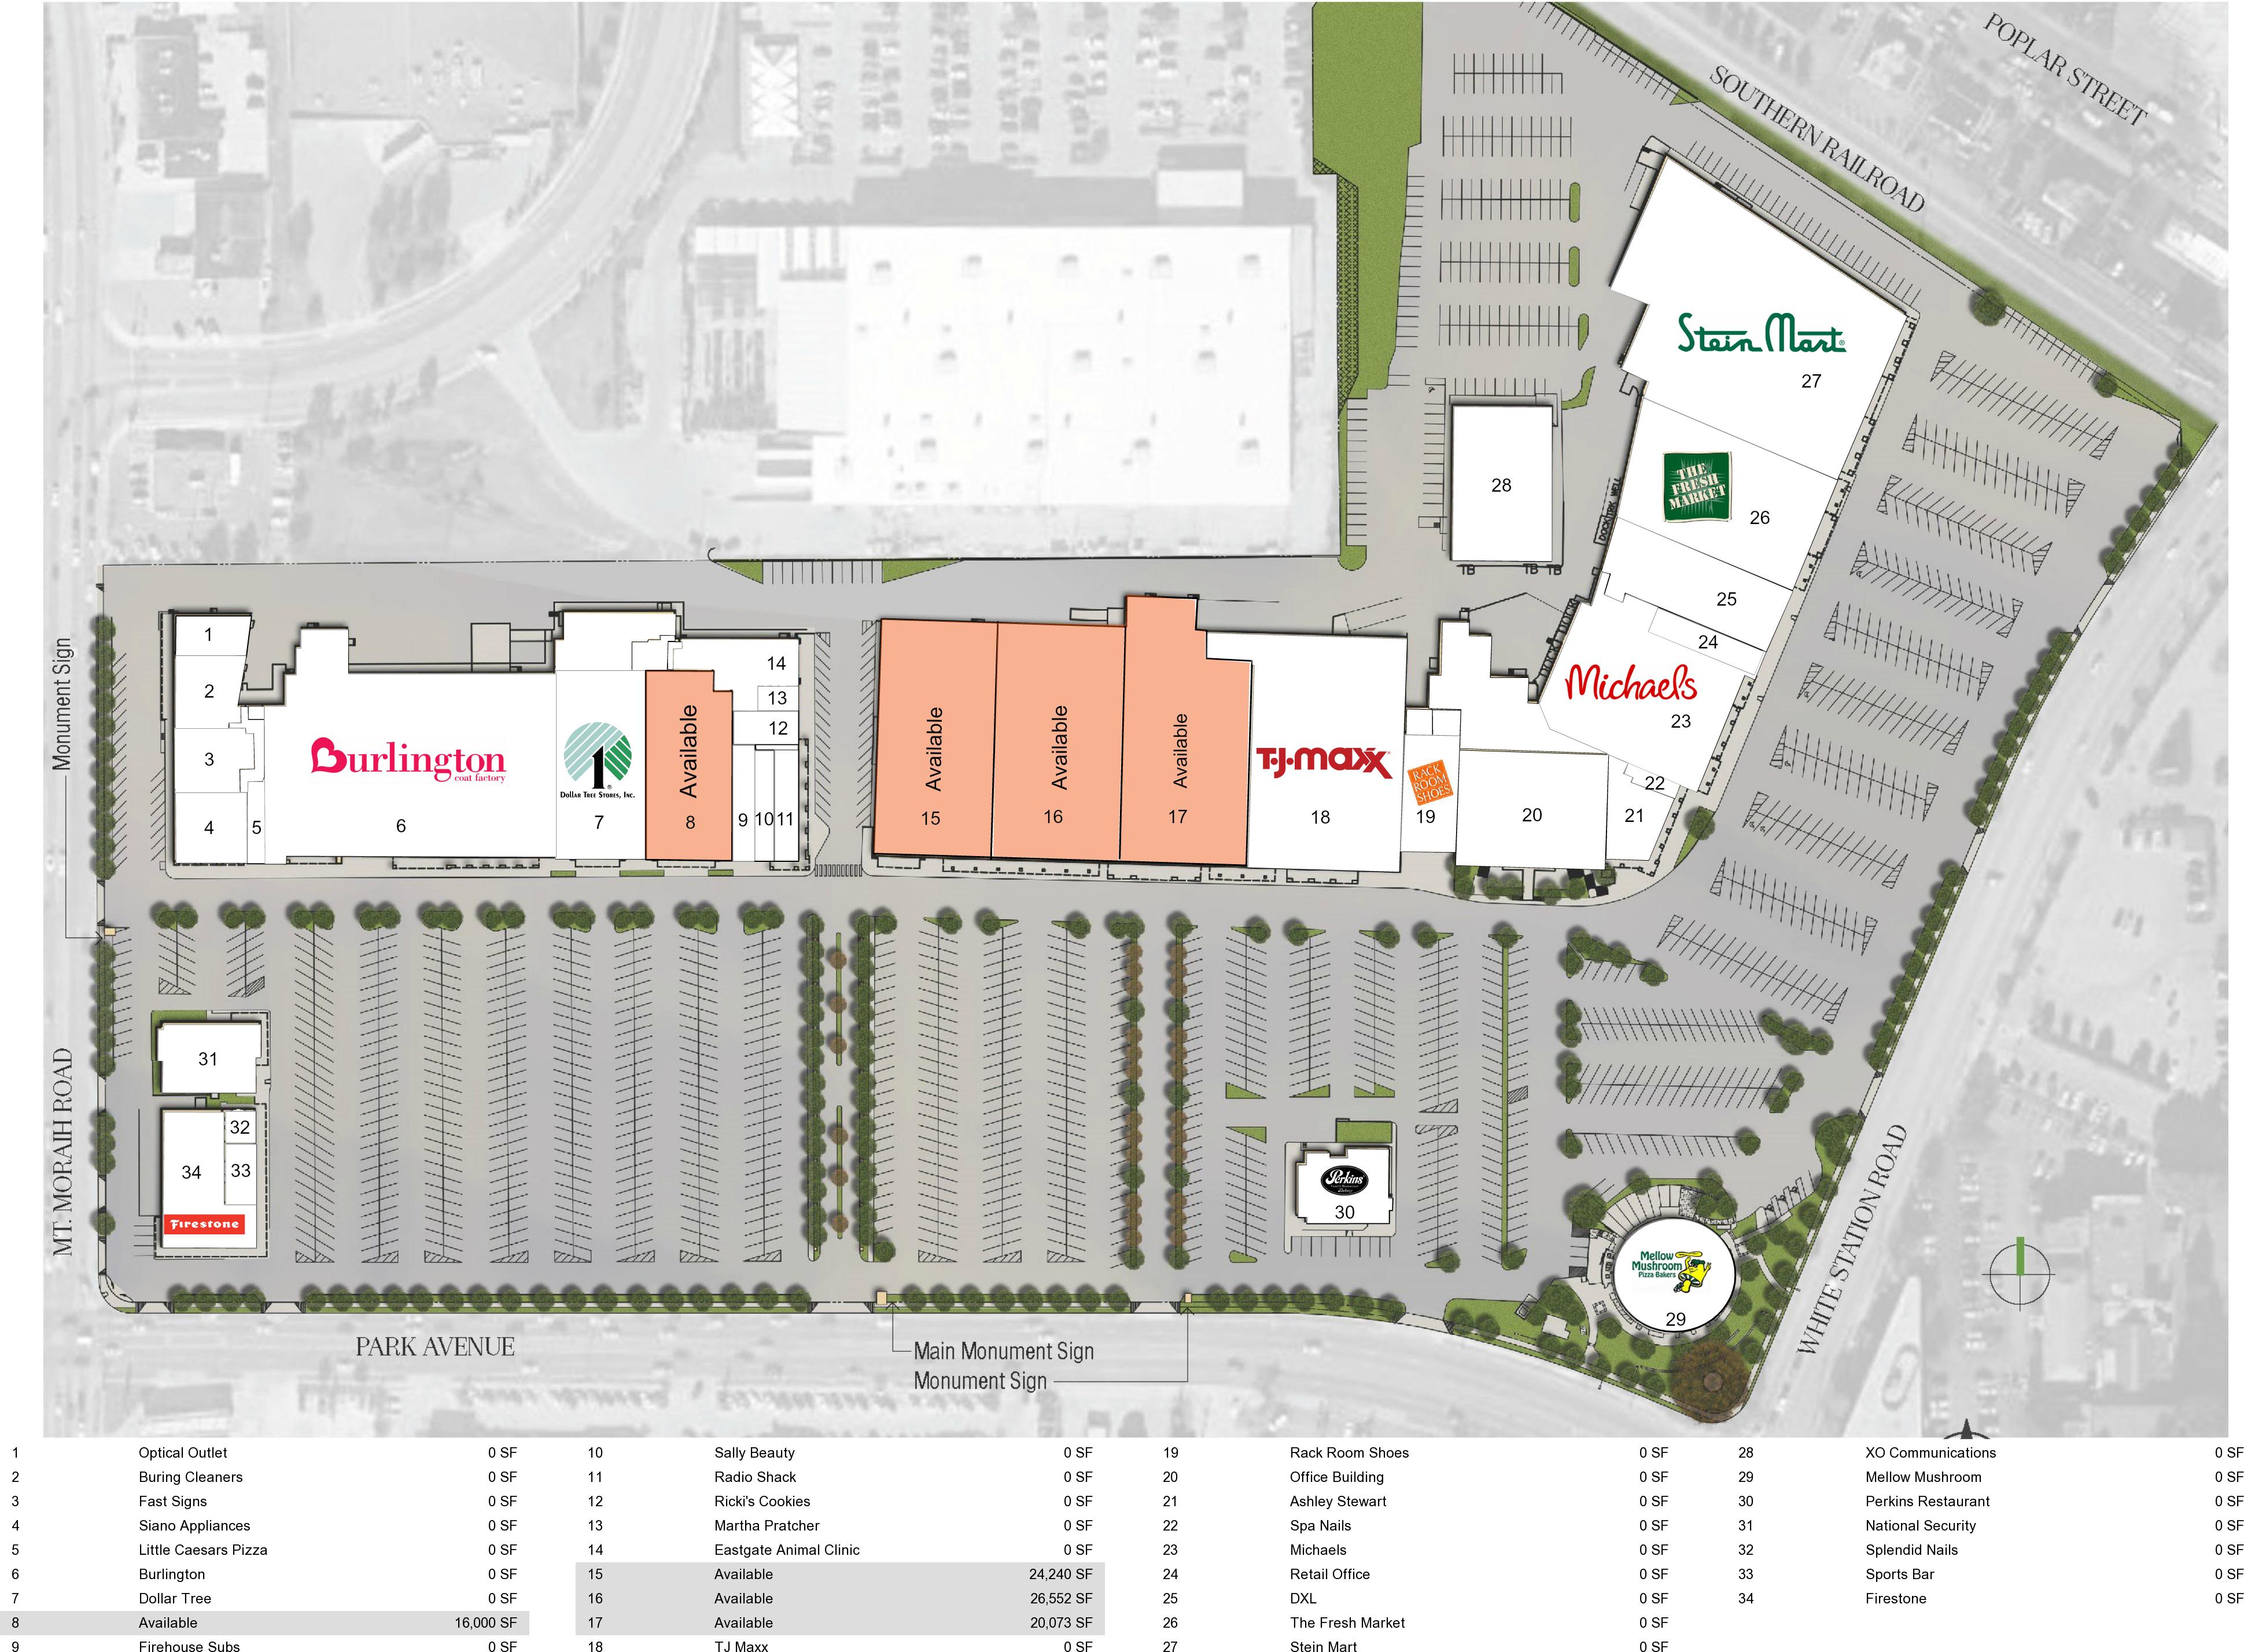 Memphis Tn Eastgate Shopping Center Retail Space For Lease Shopping Center Retail Space For Lease Property Search